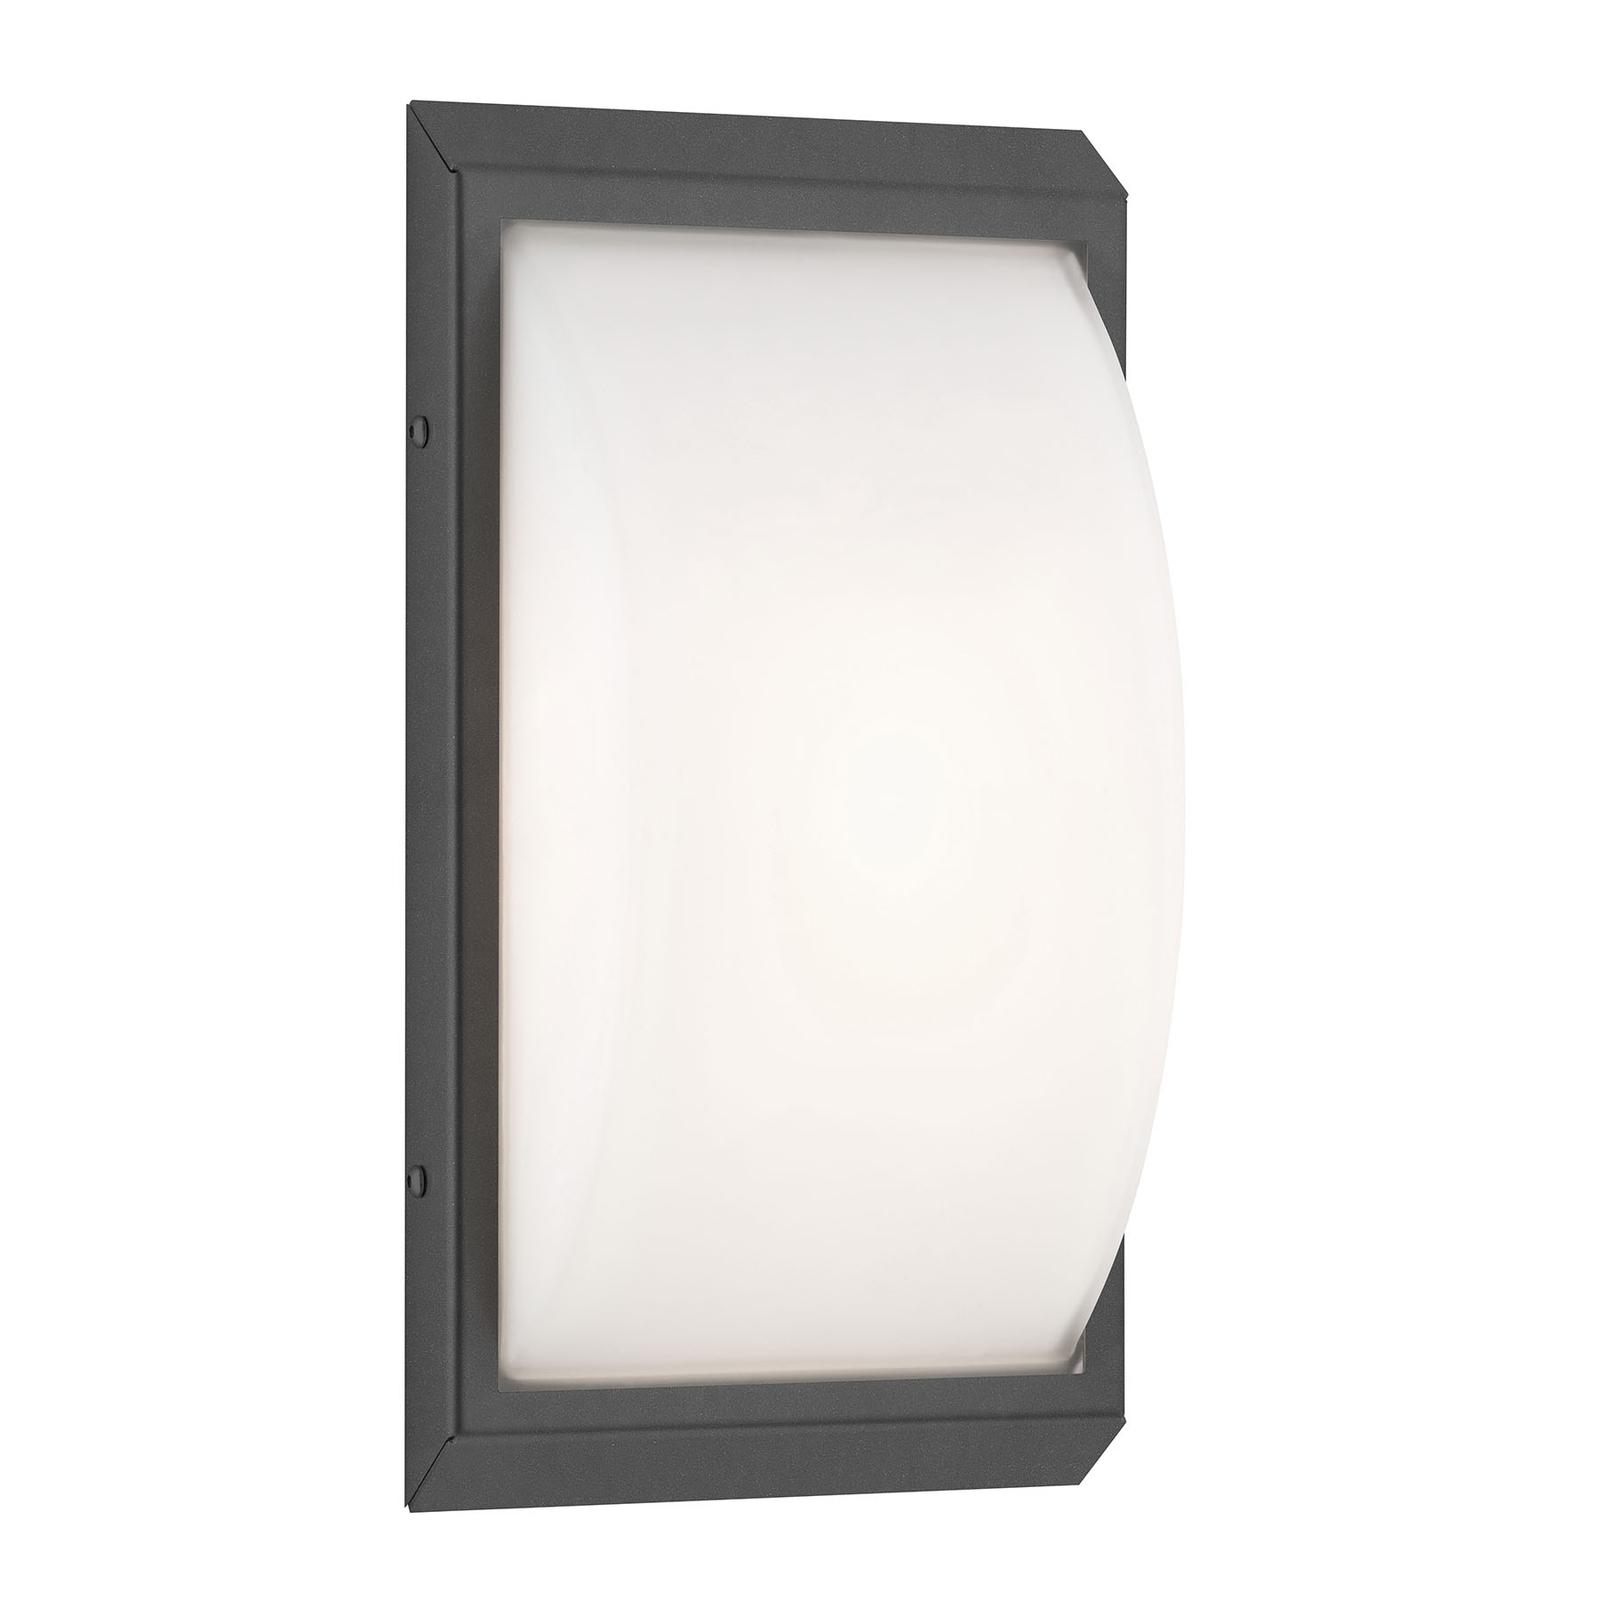 LED buitenwandlamp 053, bewegingsmelder, grafiet